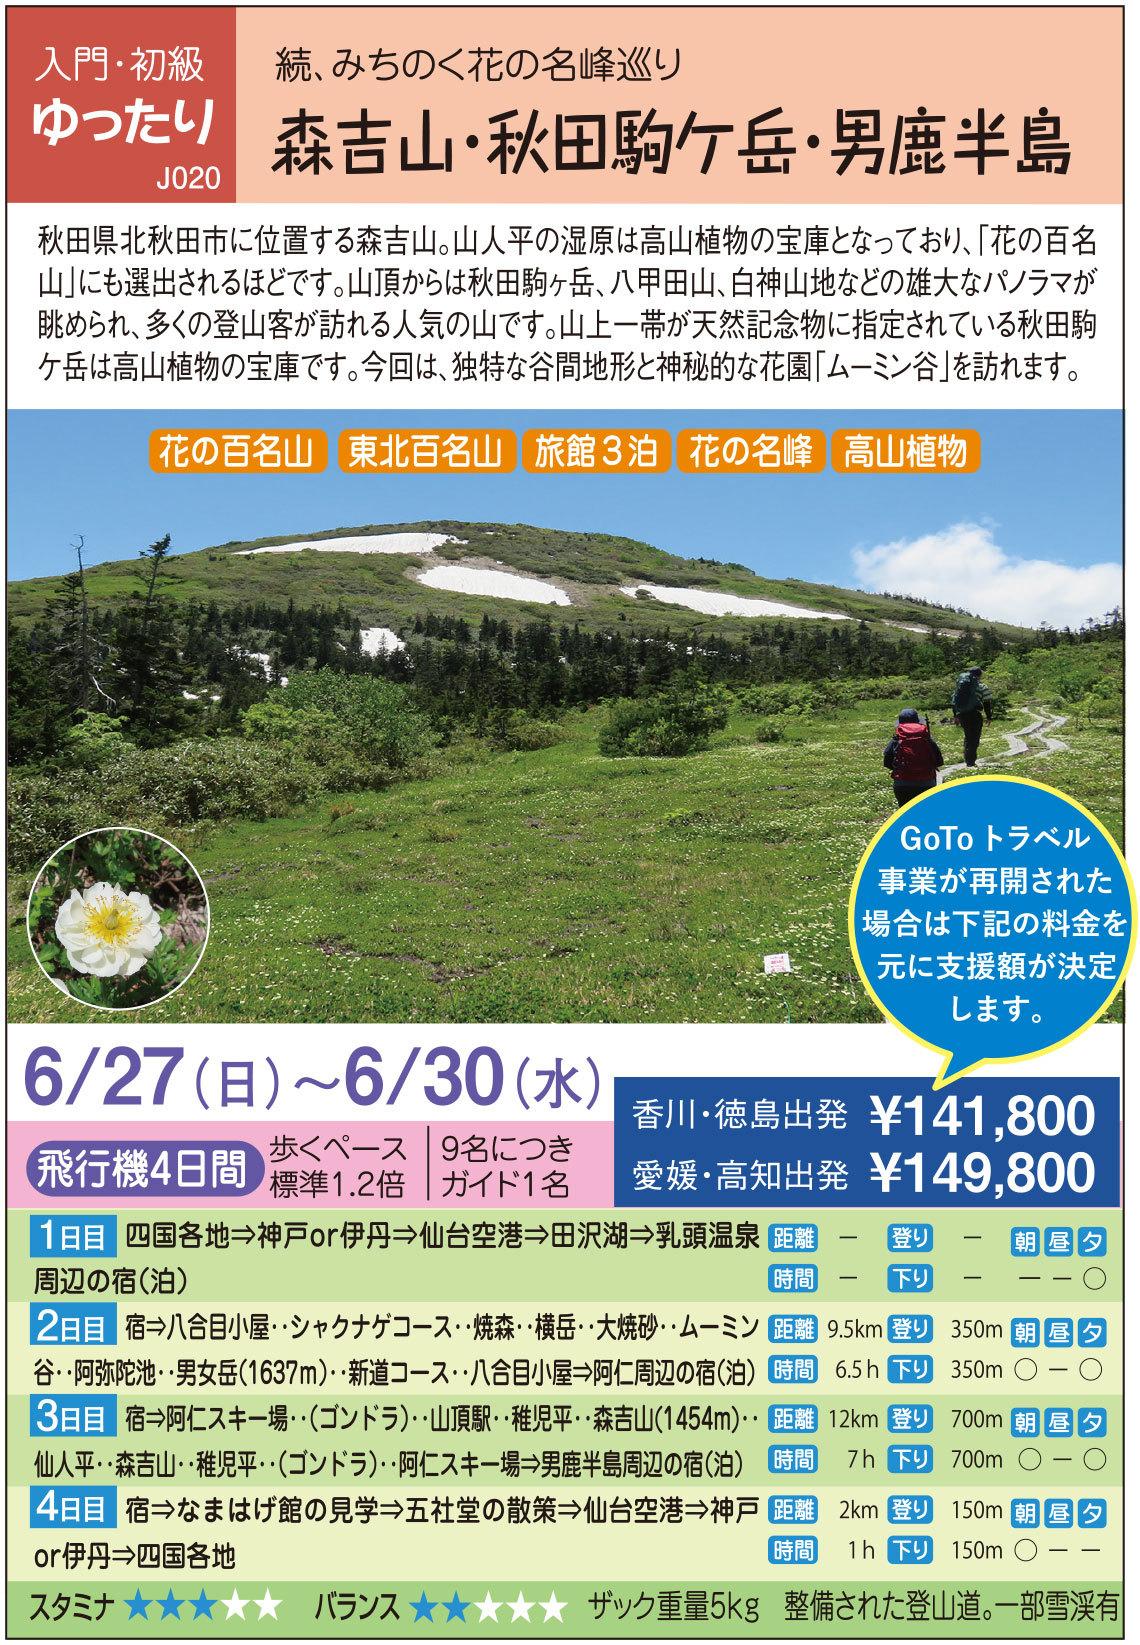 j020moriyoshi.jpg